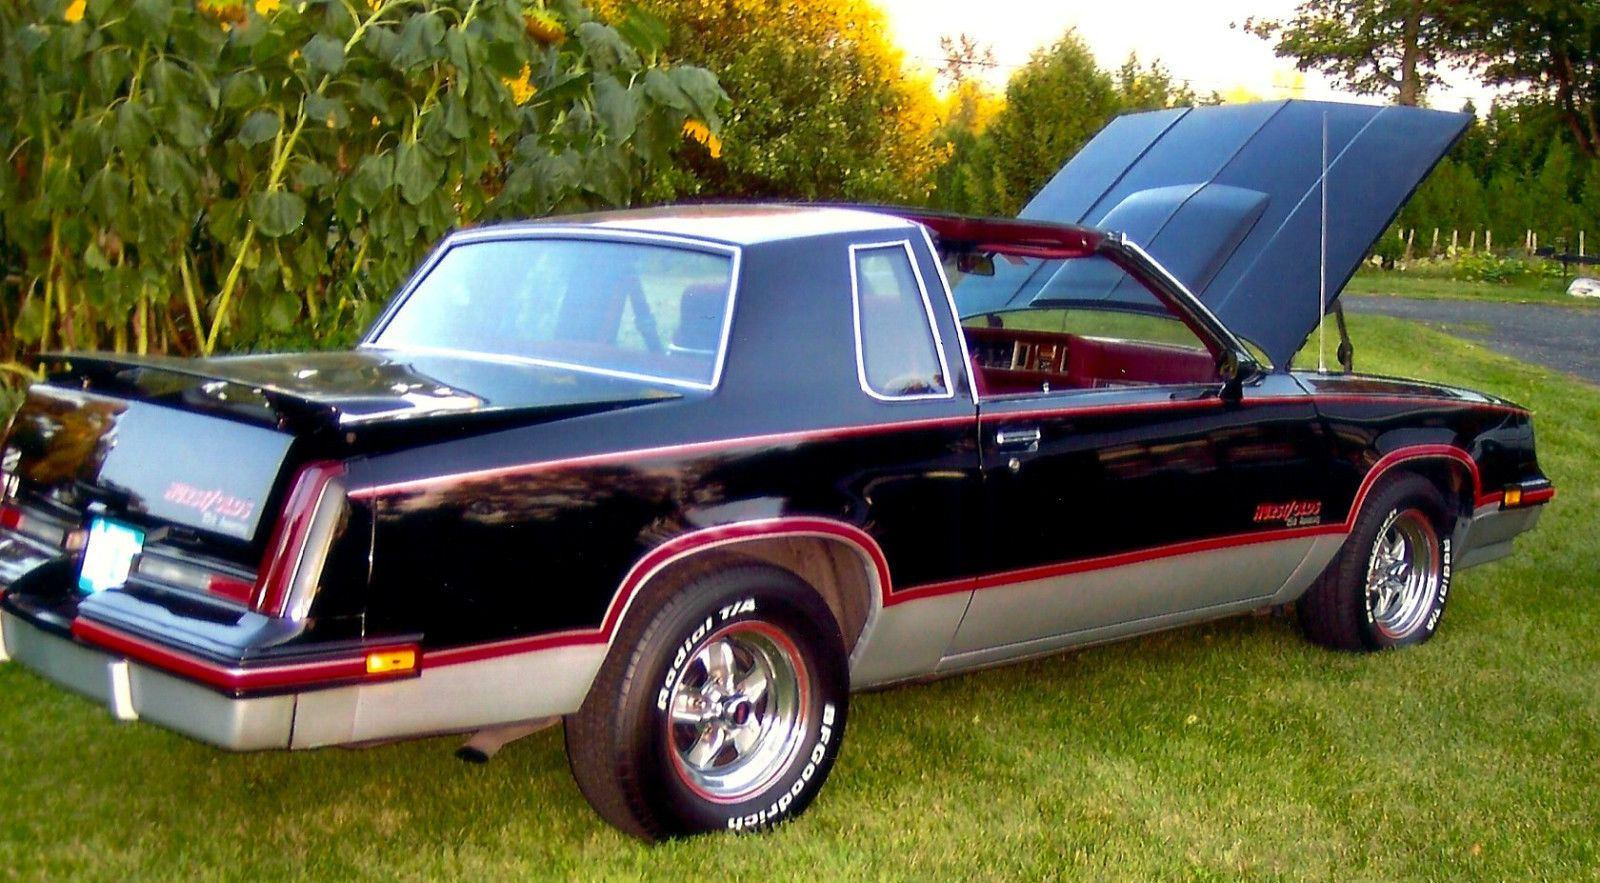 1983 Oldsmobile Cutlass Hurst 15th Anniversary Edition For